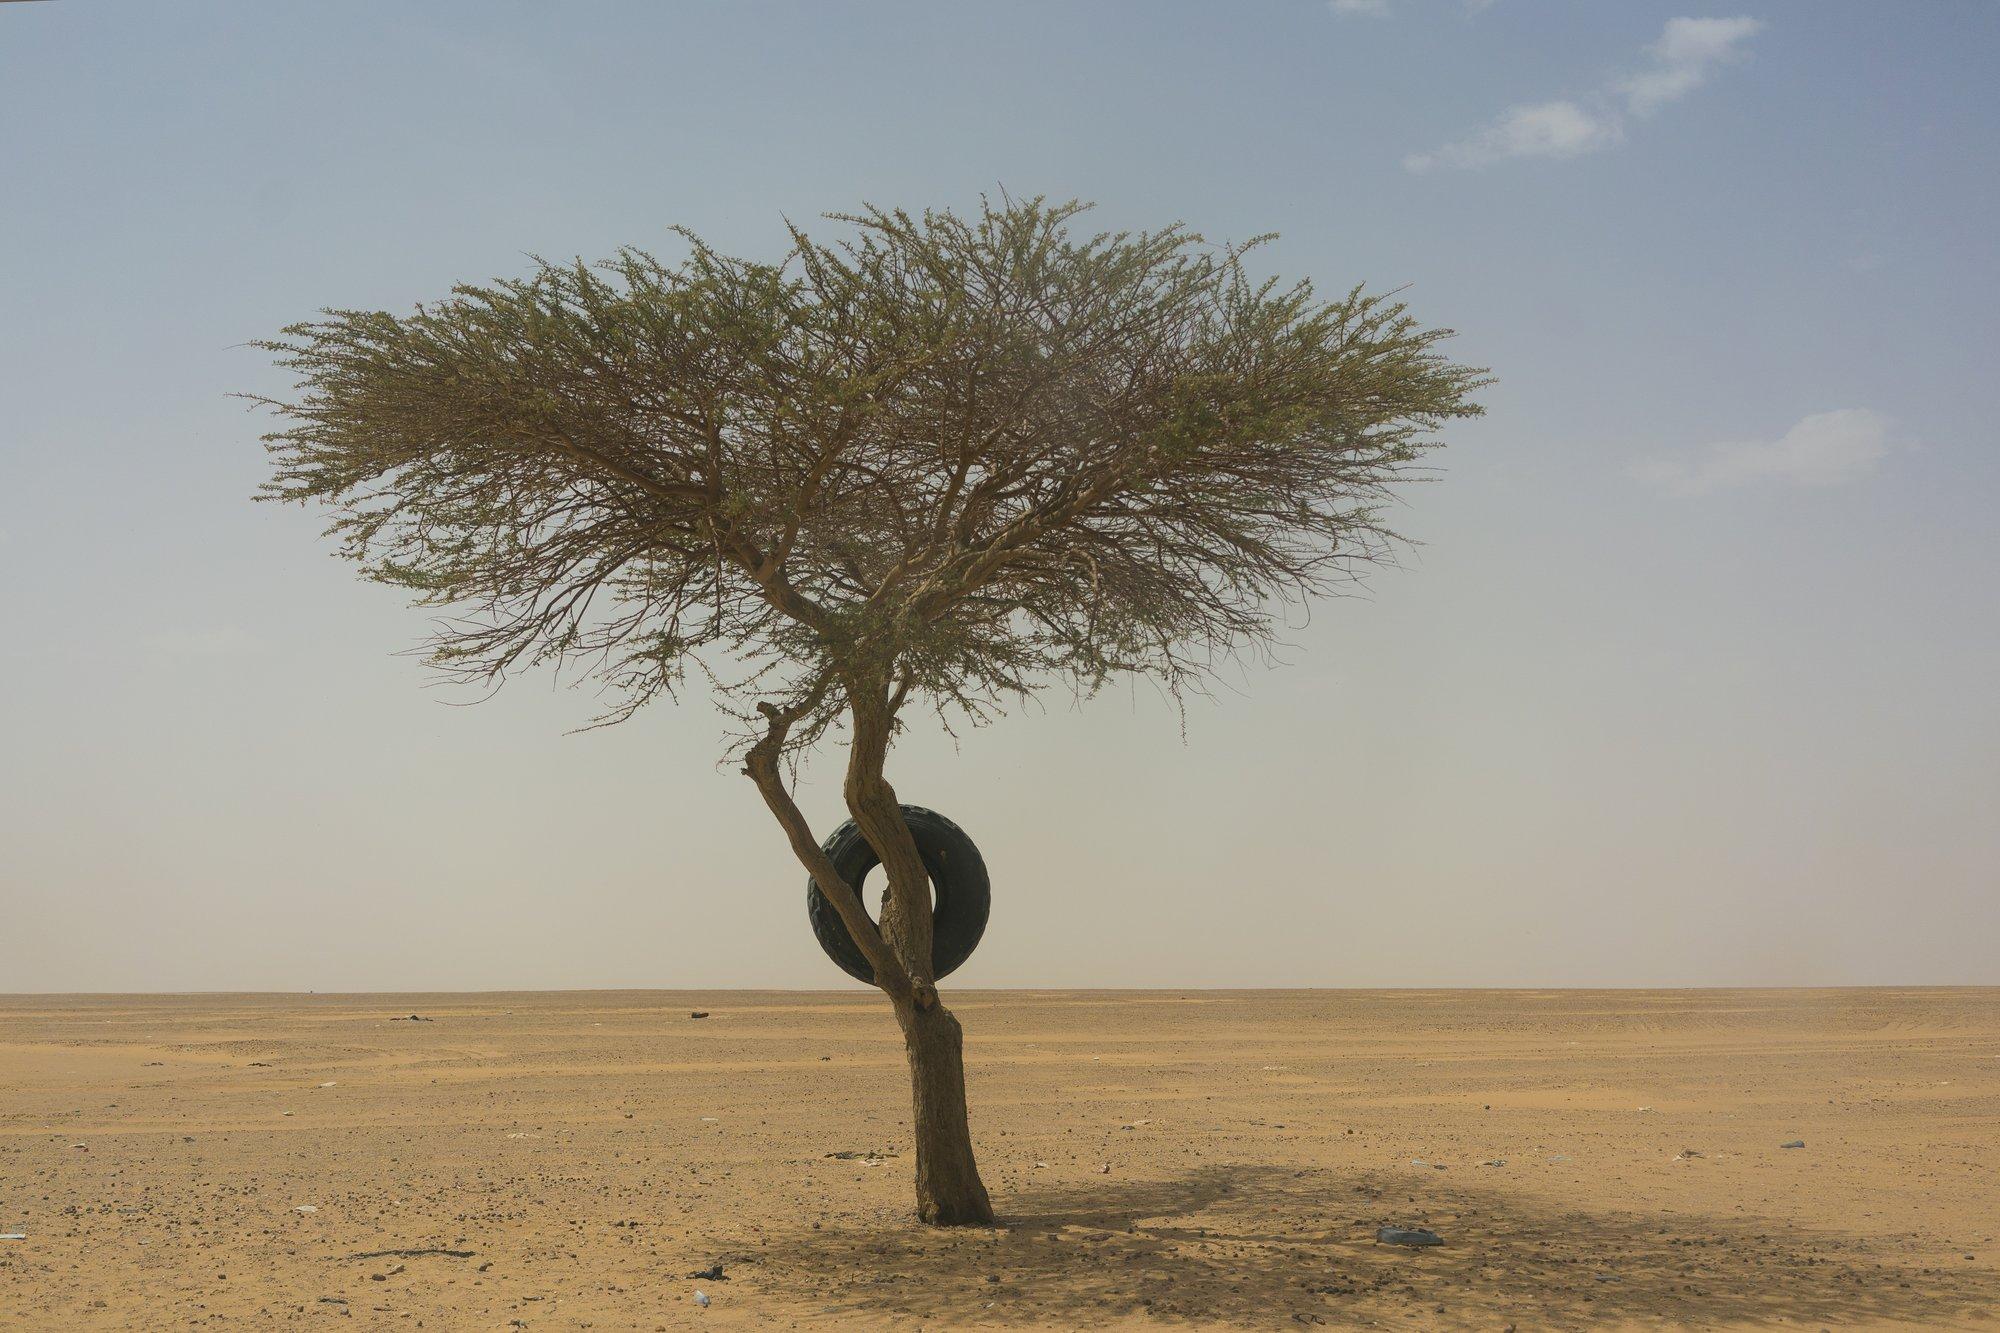 Sahara desert swings between wet and dry every 20,000 years: study